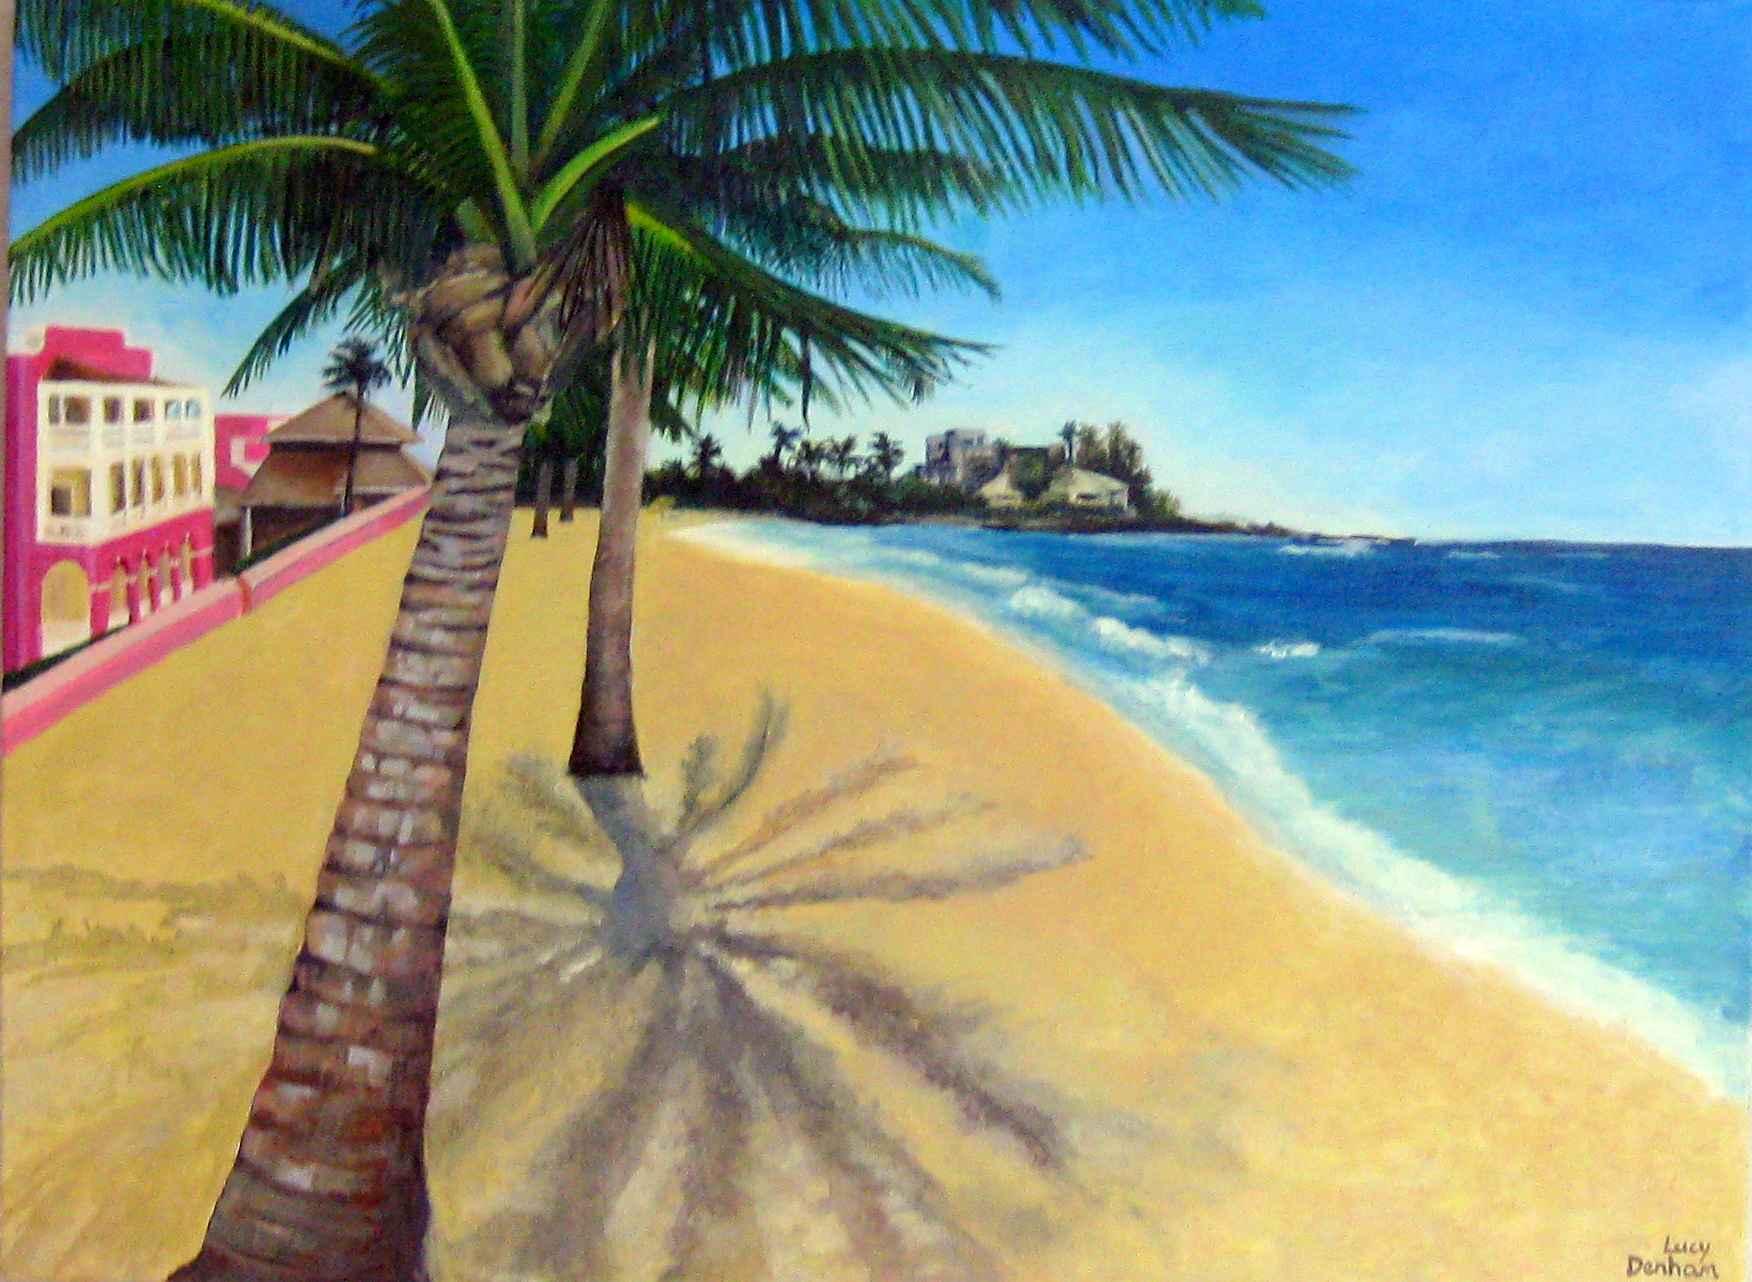 Paradise Palms by  Lucy Denham - Masterpiece Online